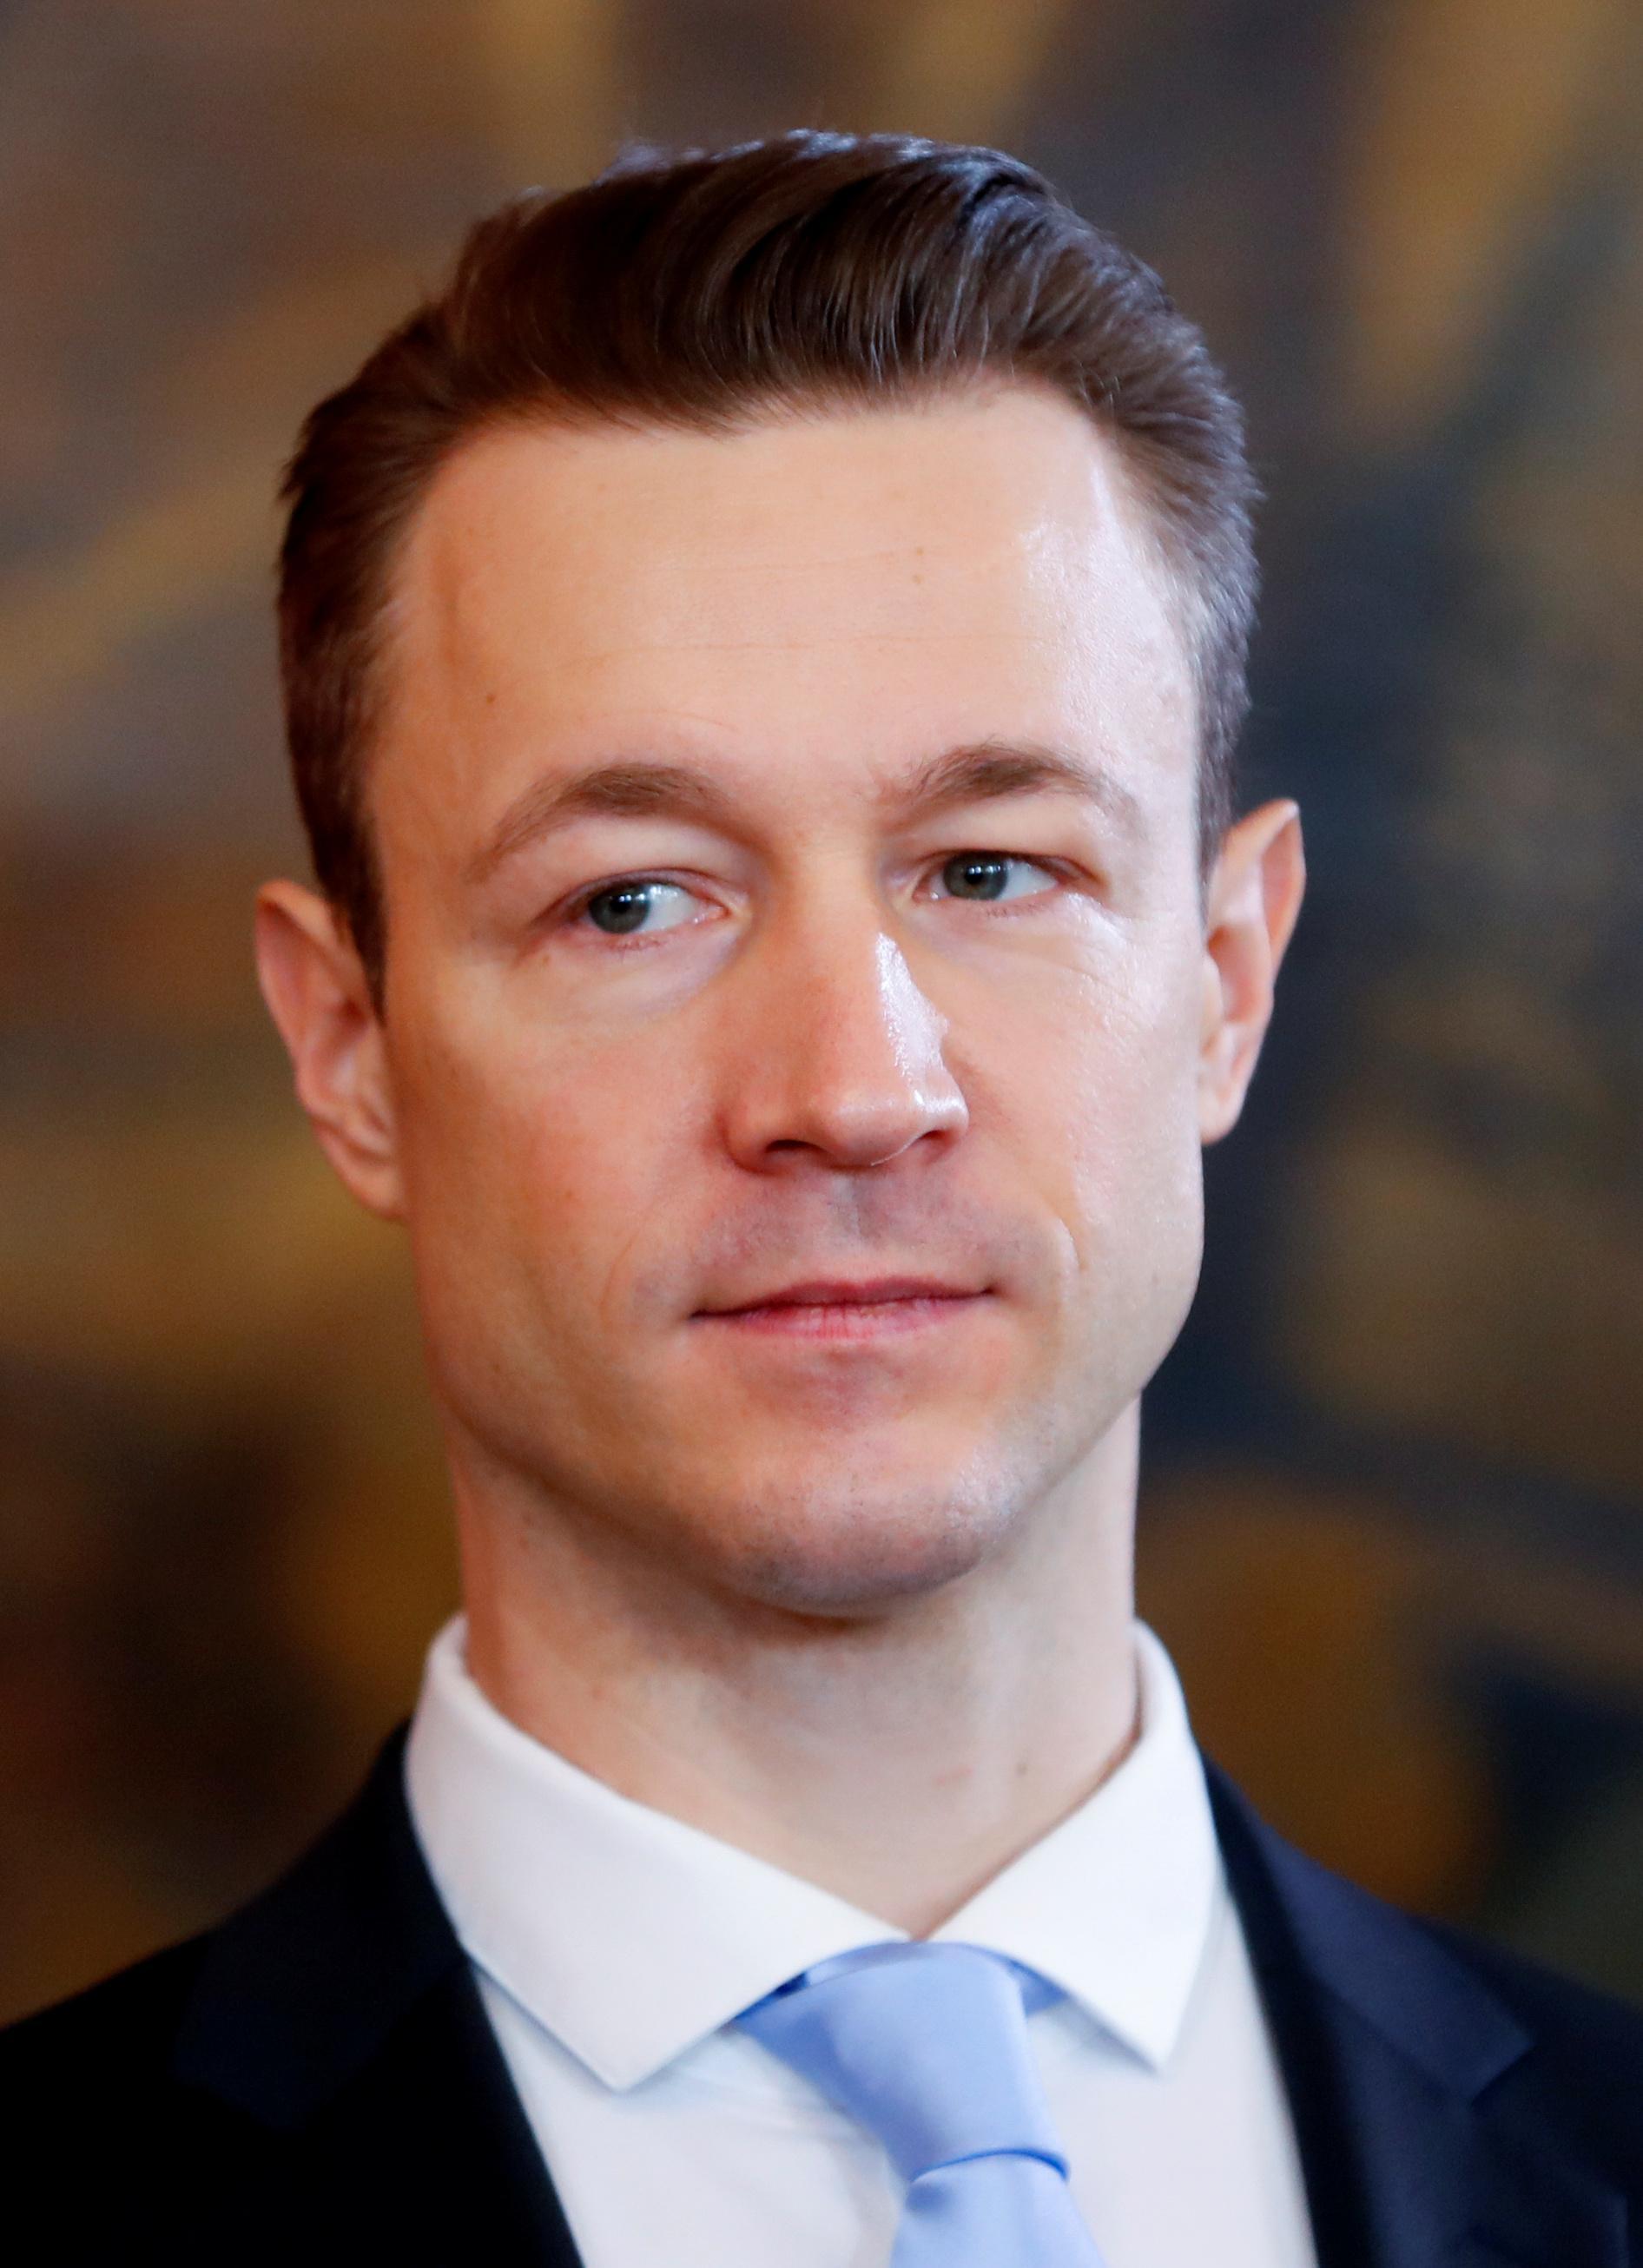 Austria opposes loosening EU budget rules, finance minister tells...